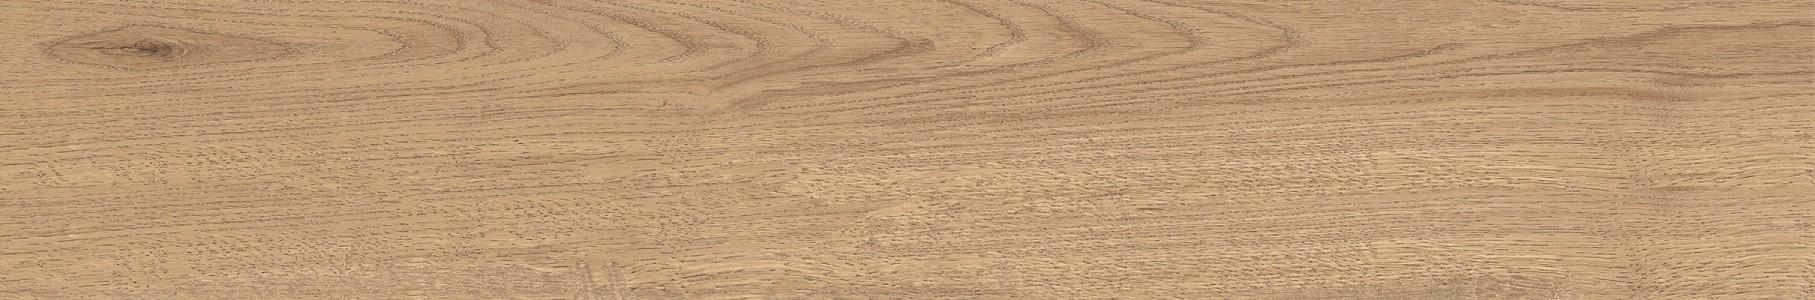 Craven Dunnill CD2M85 Oakmere Floor Tile 1210x200mm - Ochre [Pack Quantity 100]